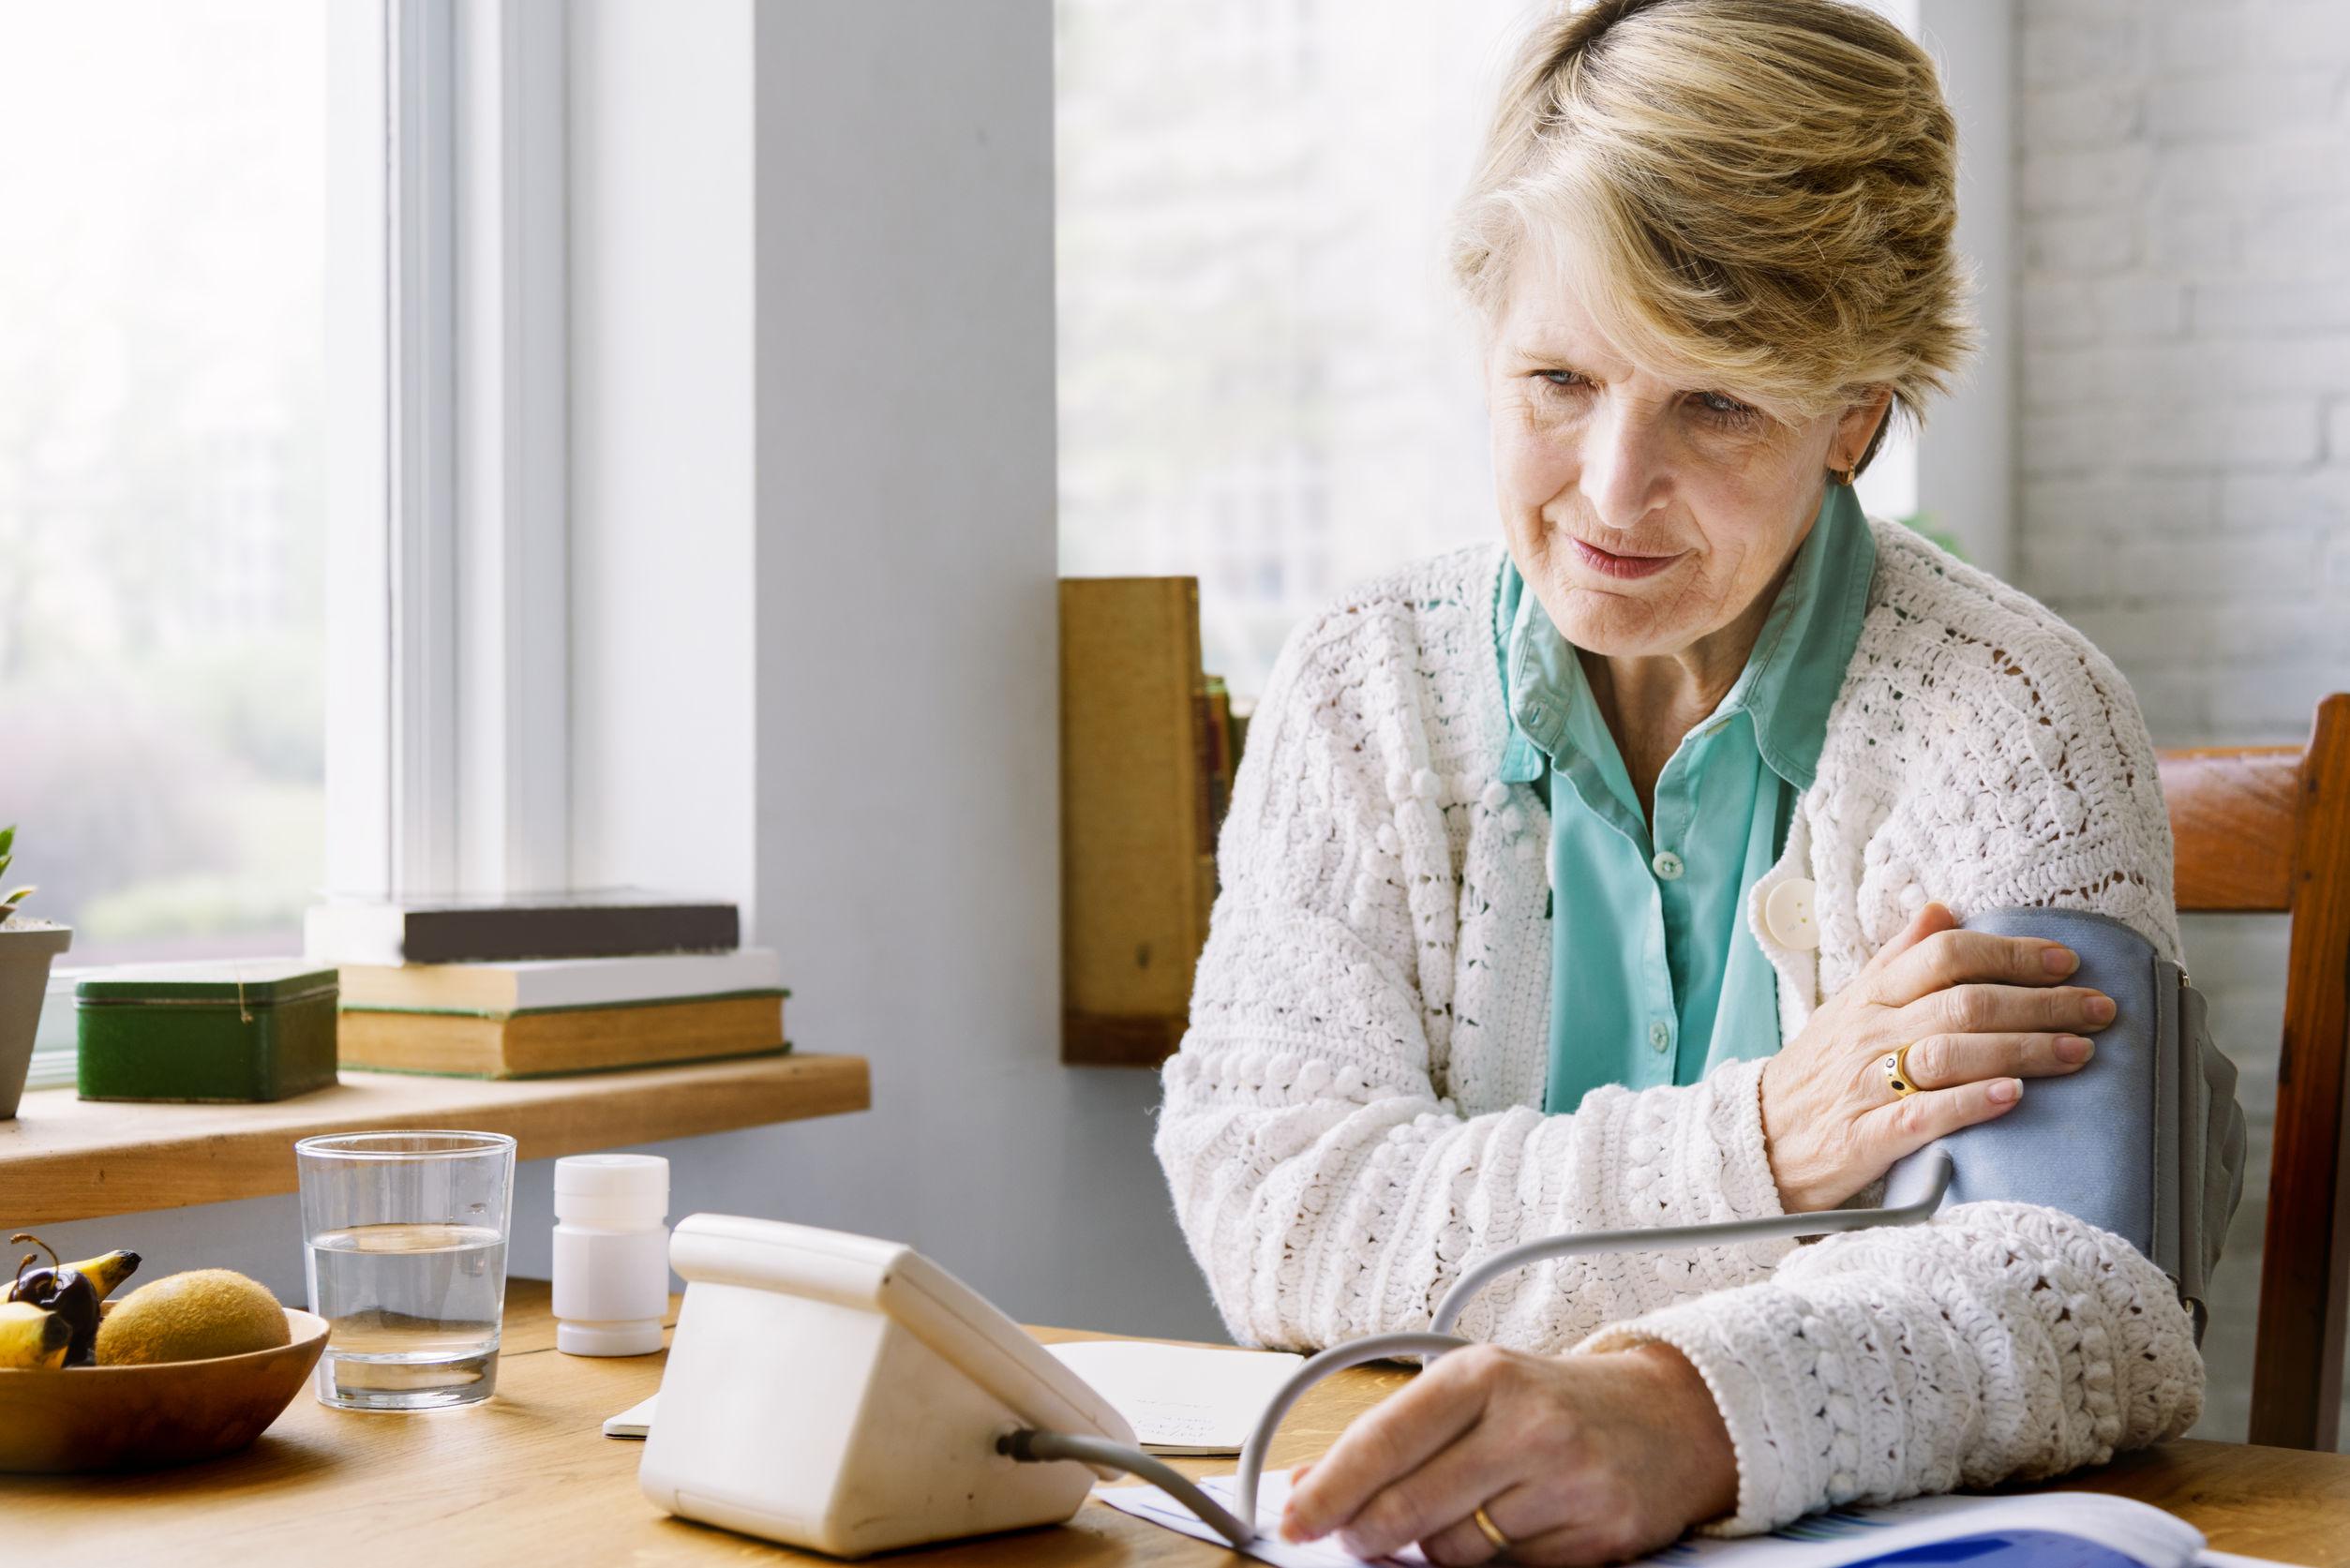 cervicalgia magas vérnyomás pontokat a magas vérnyomás kezelésére